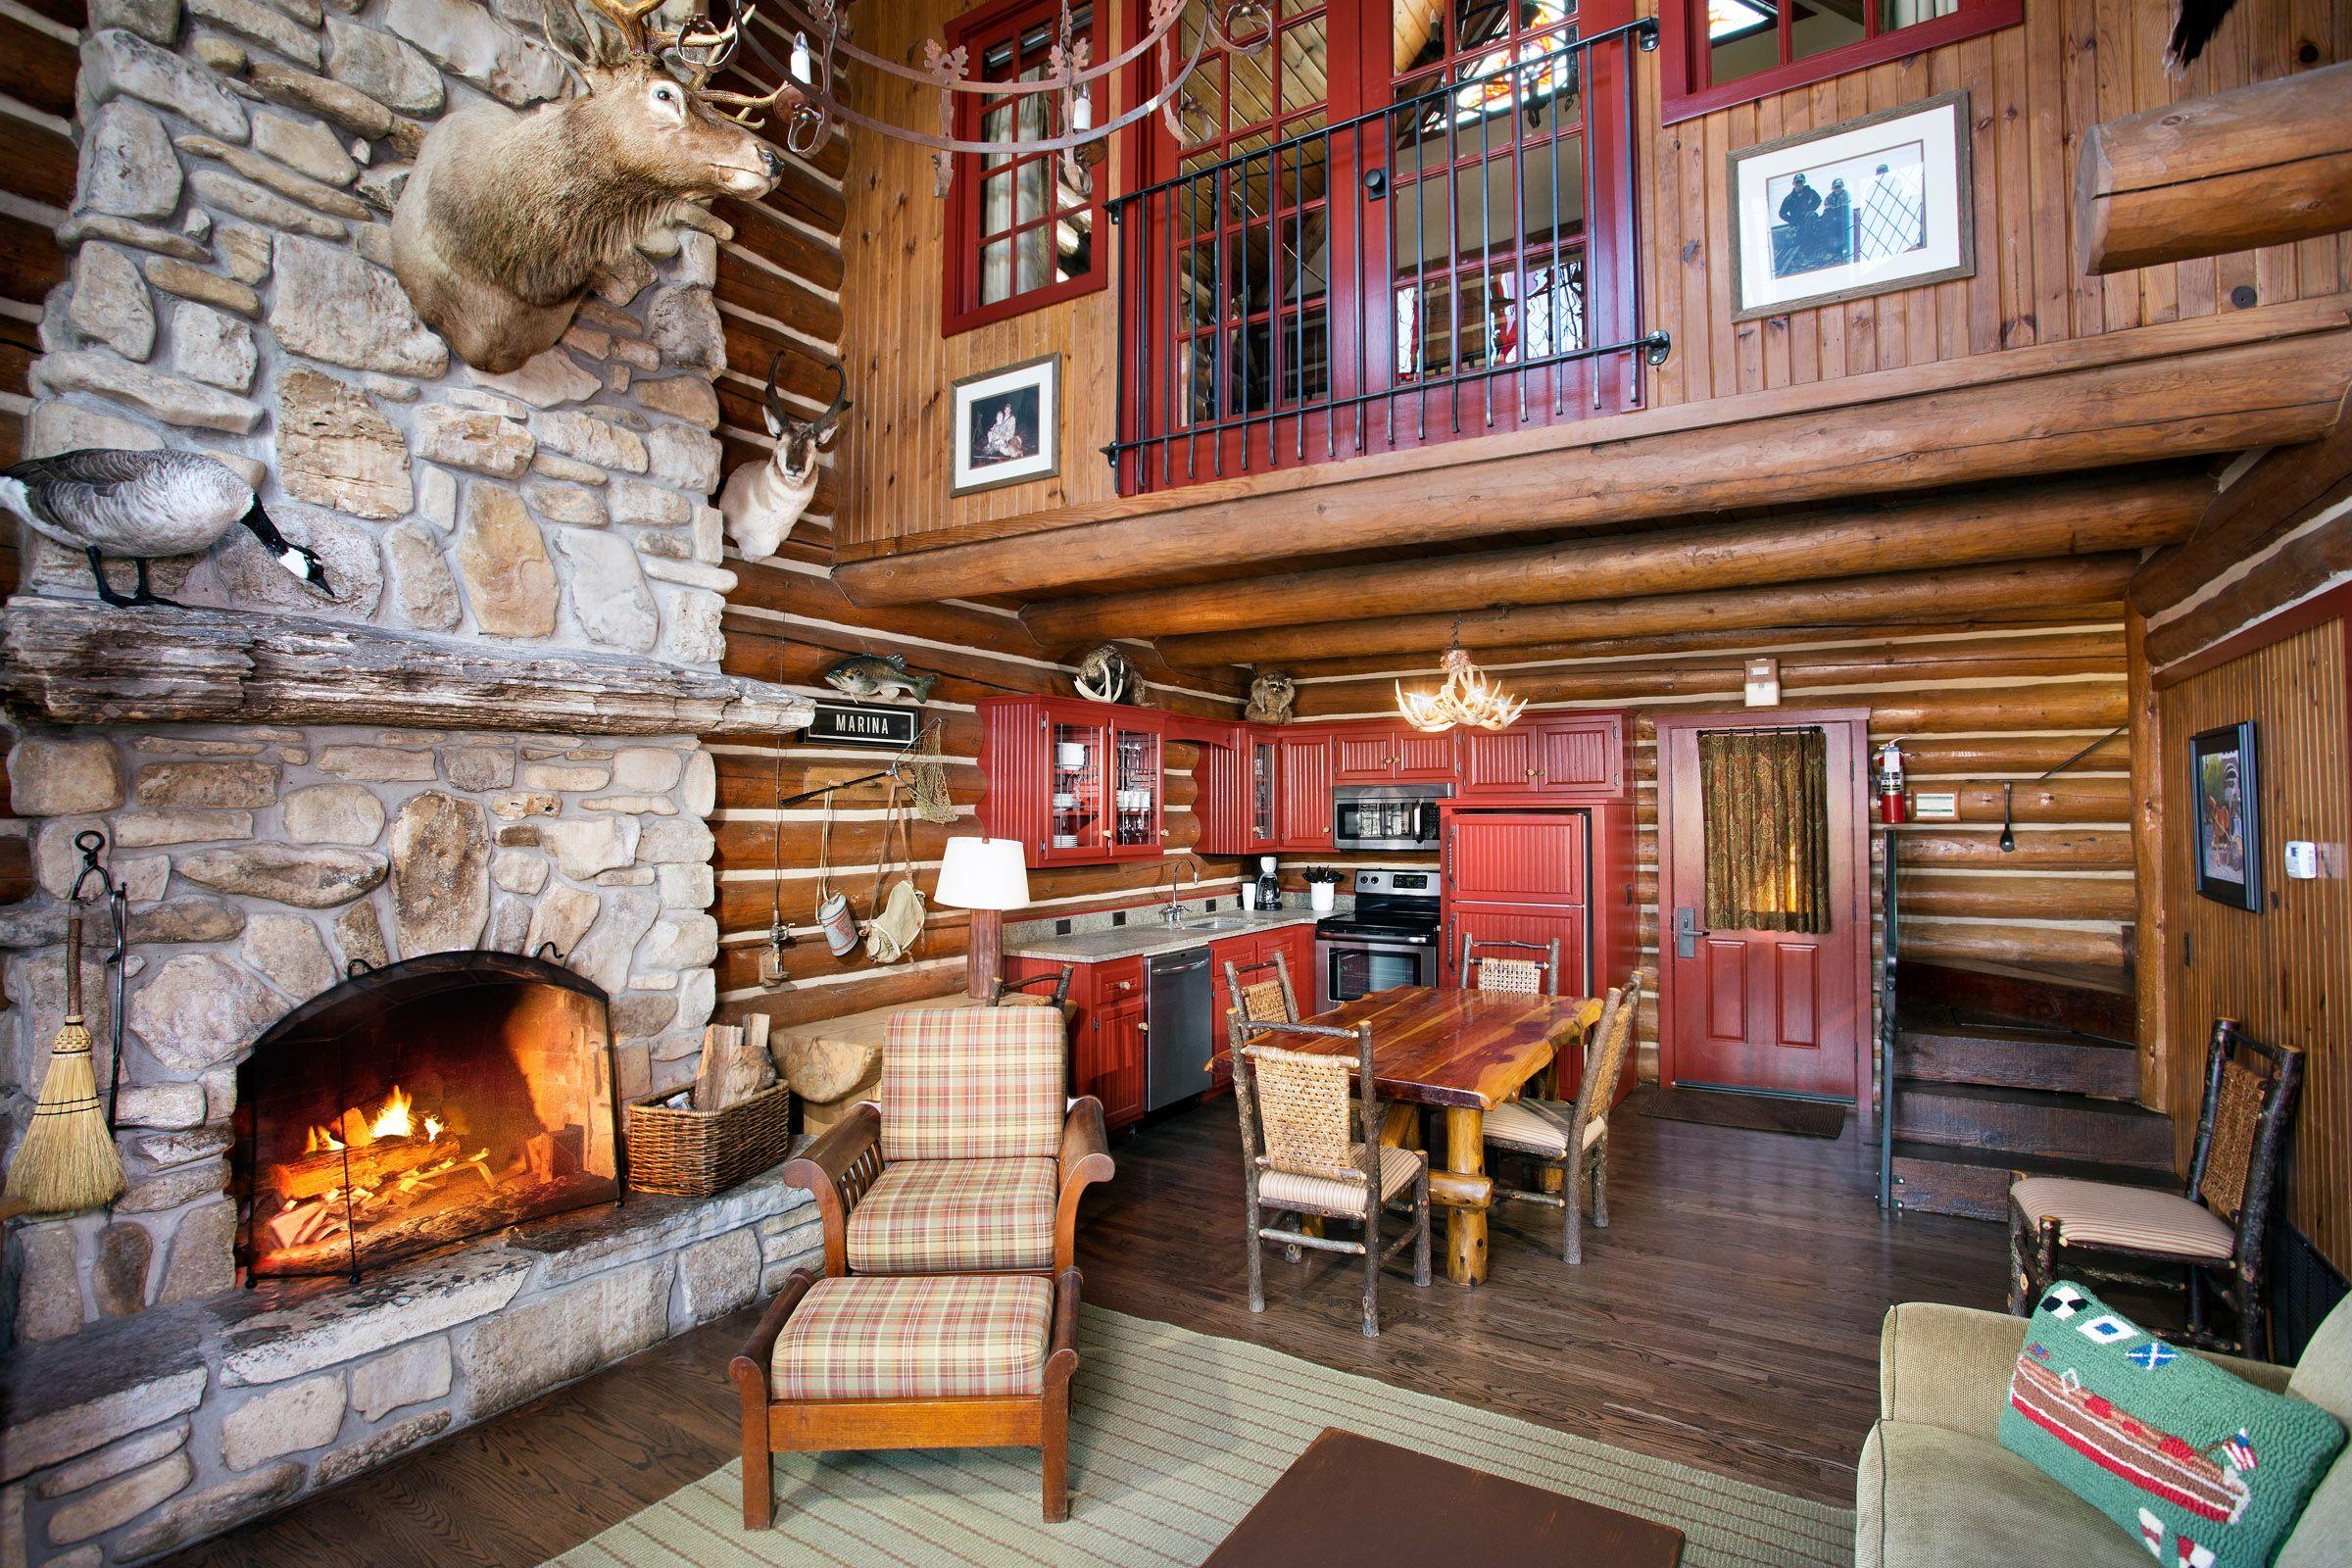 Private Two Bedroom Cabin With Loft Branson Missouri Resorts Big Cedar Branson Missouri Vacation Lodgi Big Cedar Lodge Branson One Room Cabins Cabin Loft